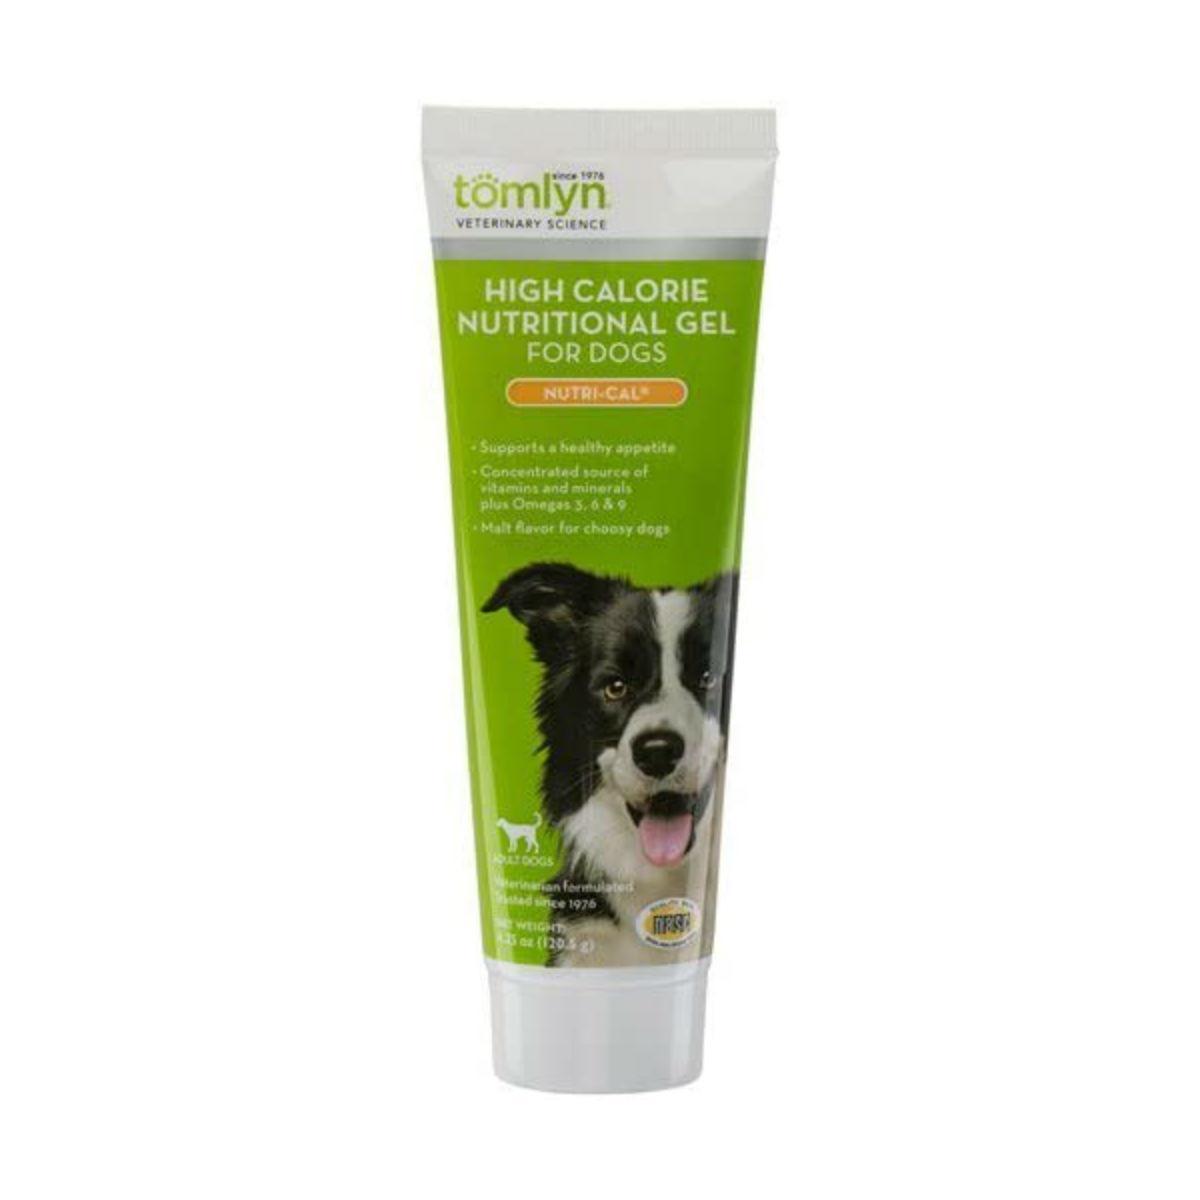 Tomlyn Nutri-Cal High Calorie Dog Supplement